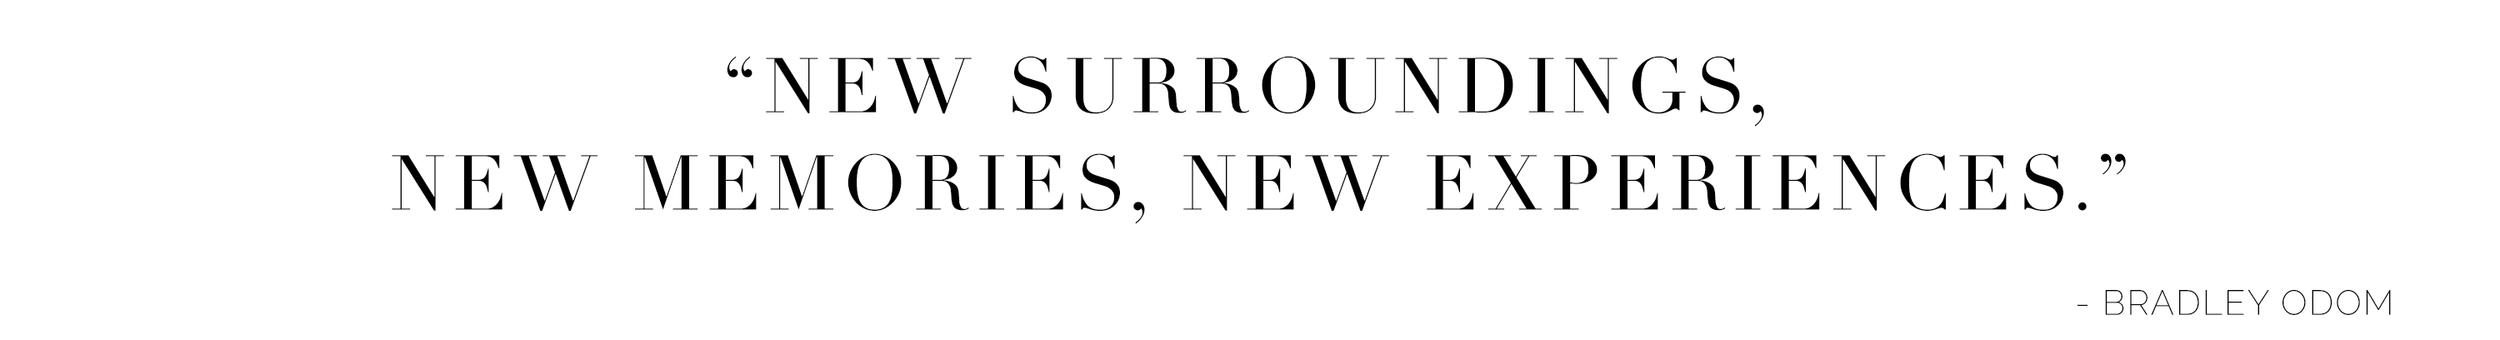 Alyssa Rosenheck's The New Southern Shop Spotlight with Bradley Odom, Dixon Rye of Atlanta, GA